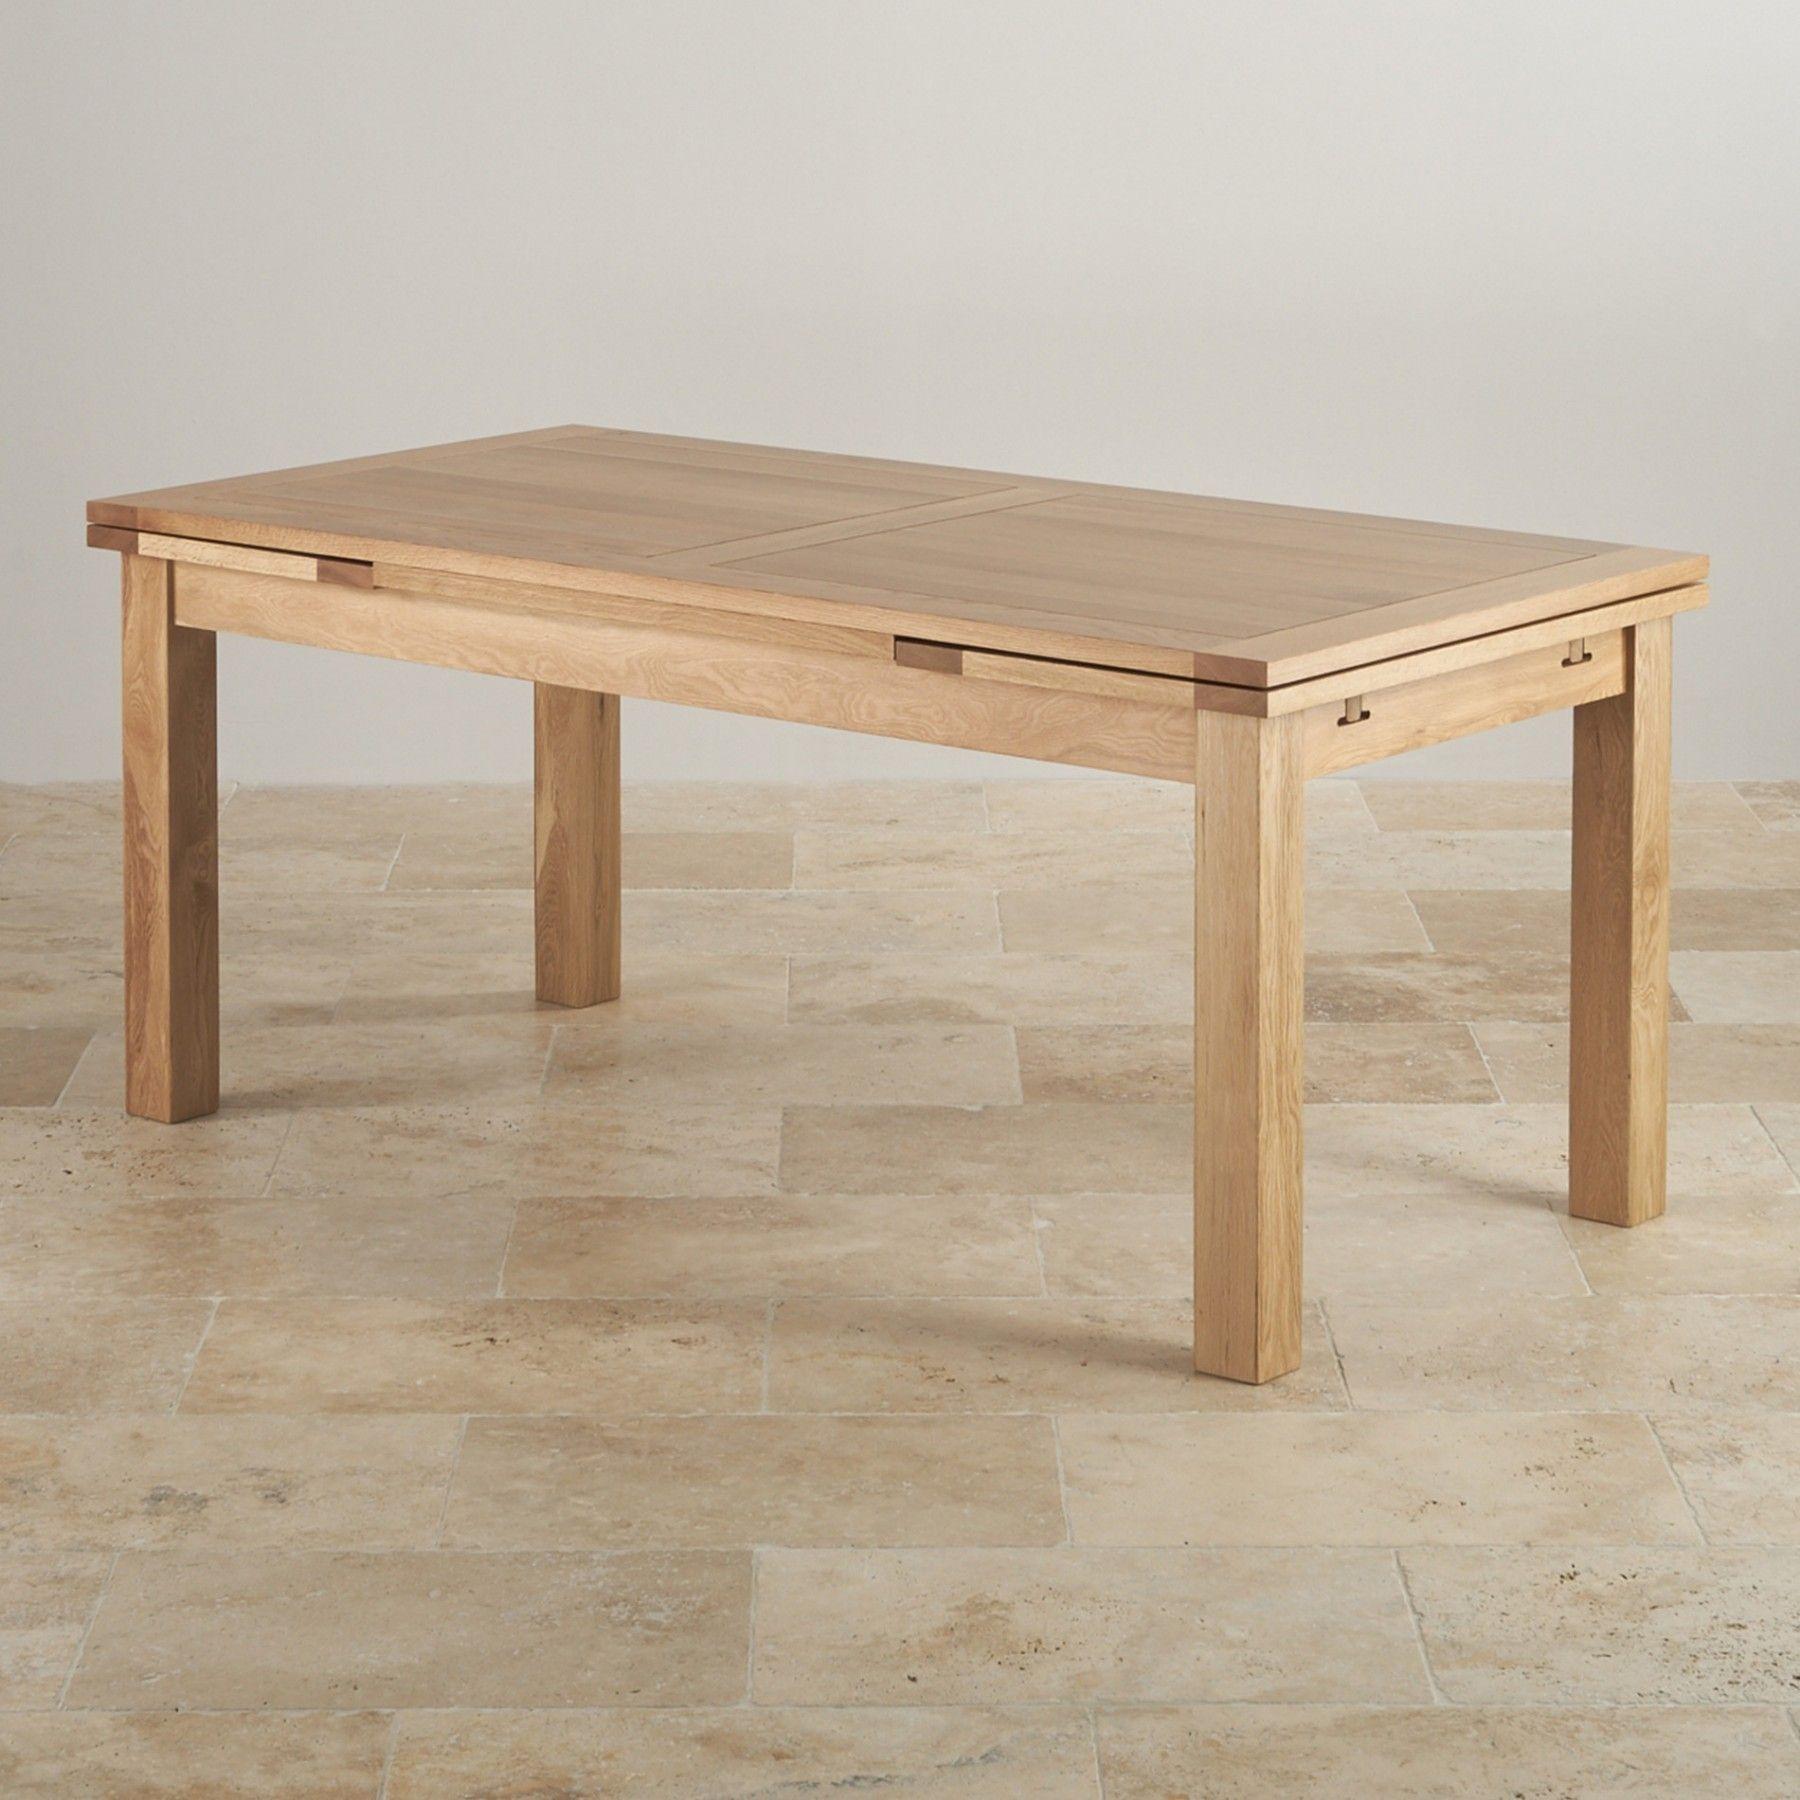 Brilliant Dorset 6Ft X 3Ft Natural Solid Oak Extending Dining Table Machost Co Dining Chair Design Ideas Machostcouk